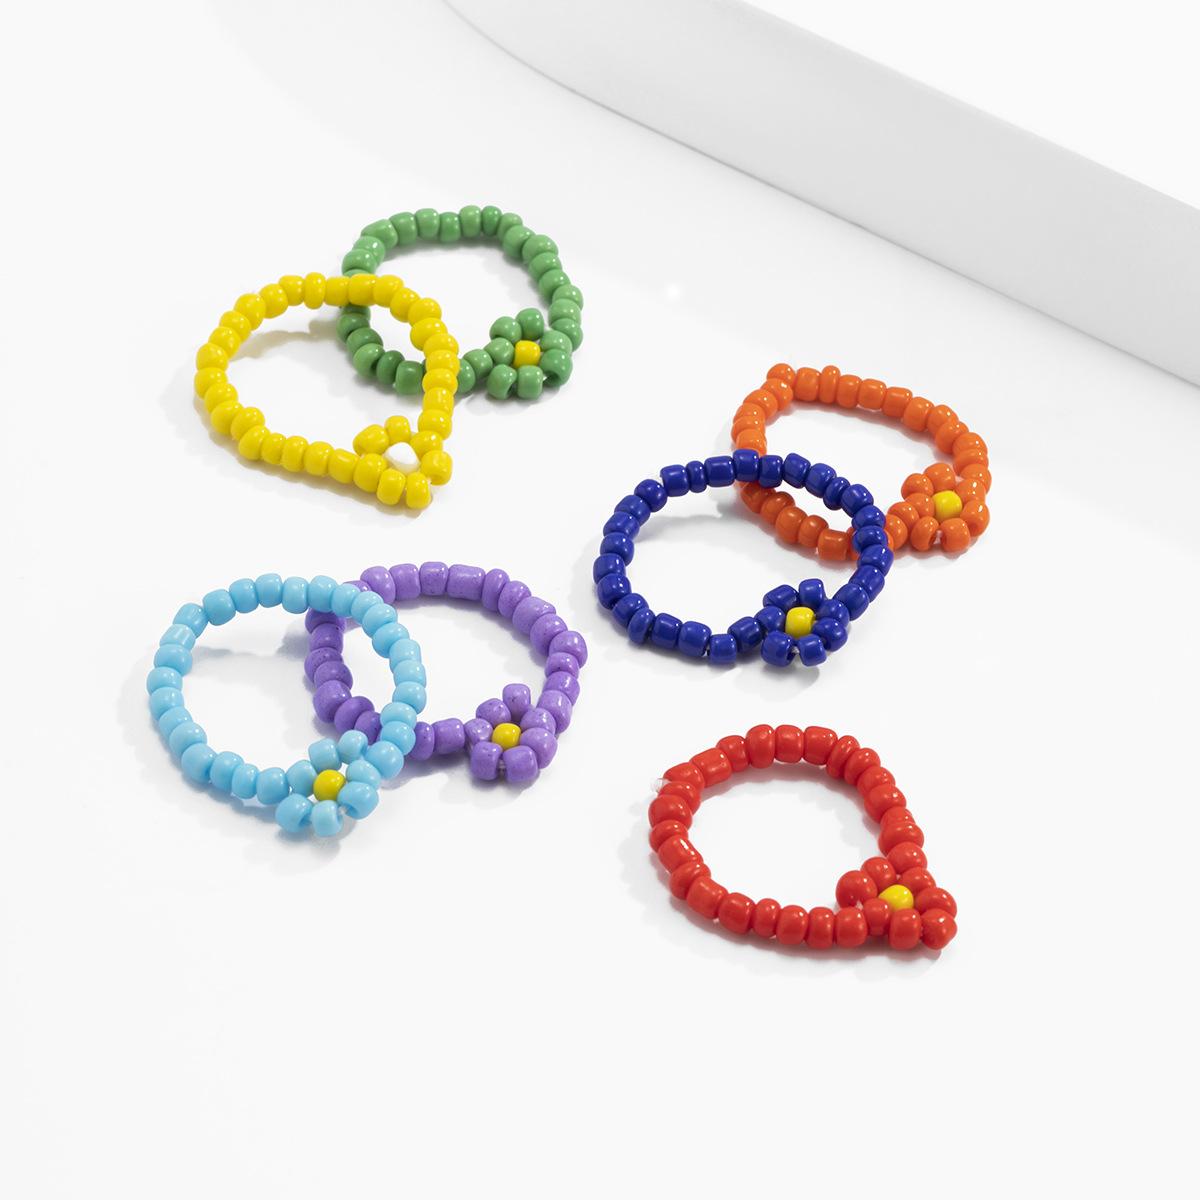 LW Bead Decoration Ring